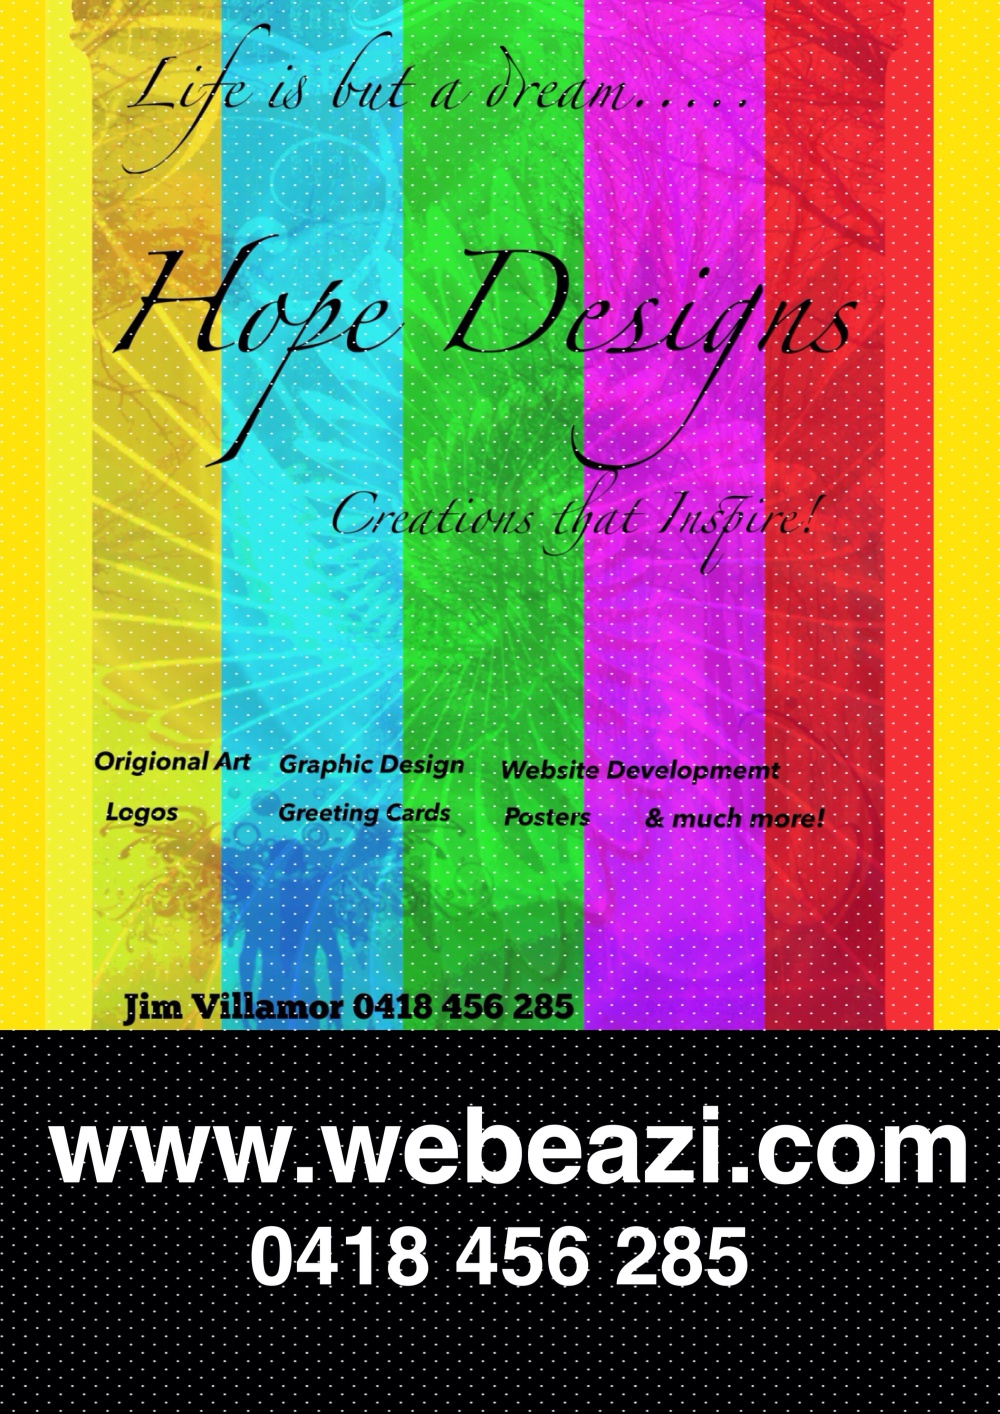 Hope Designs